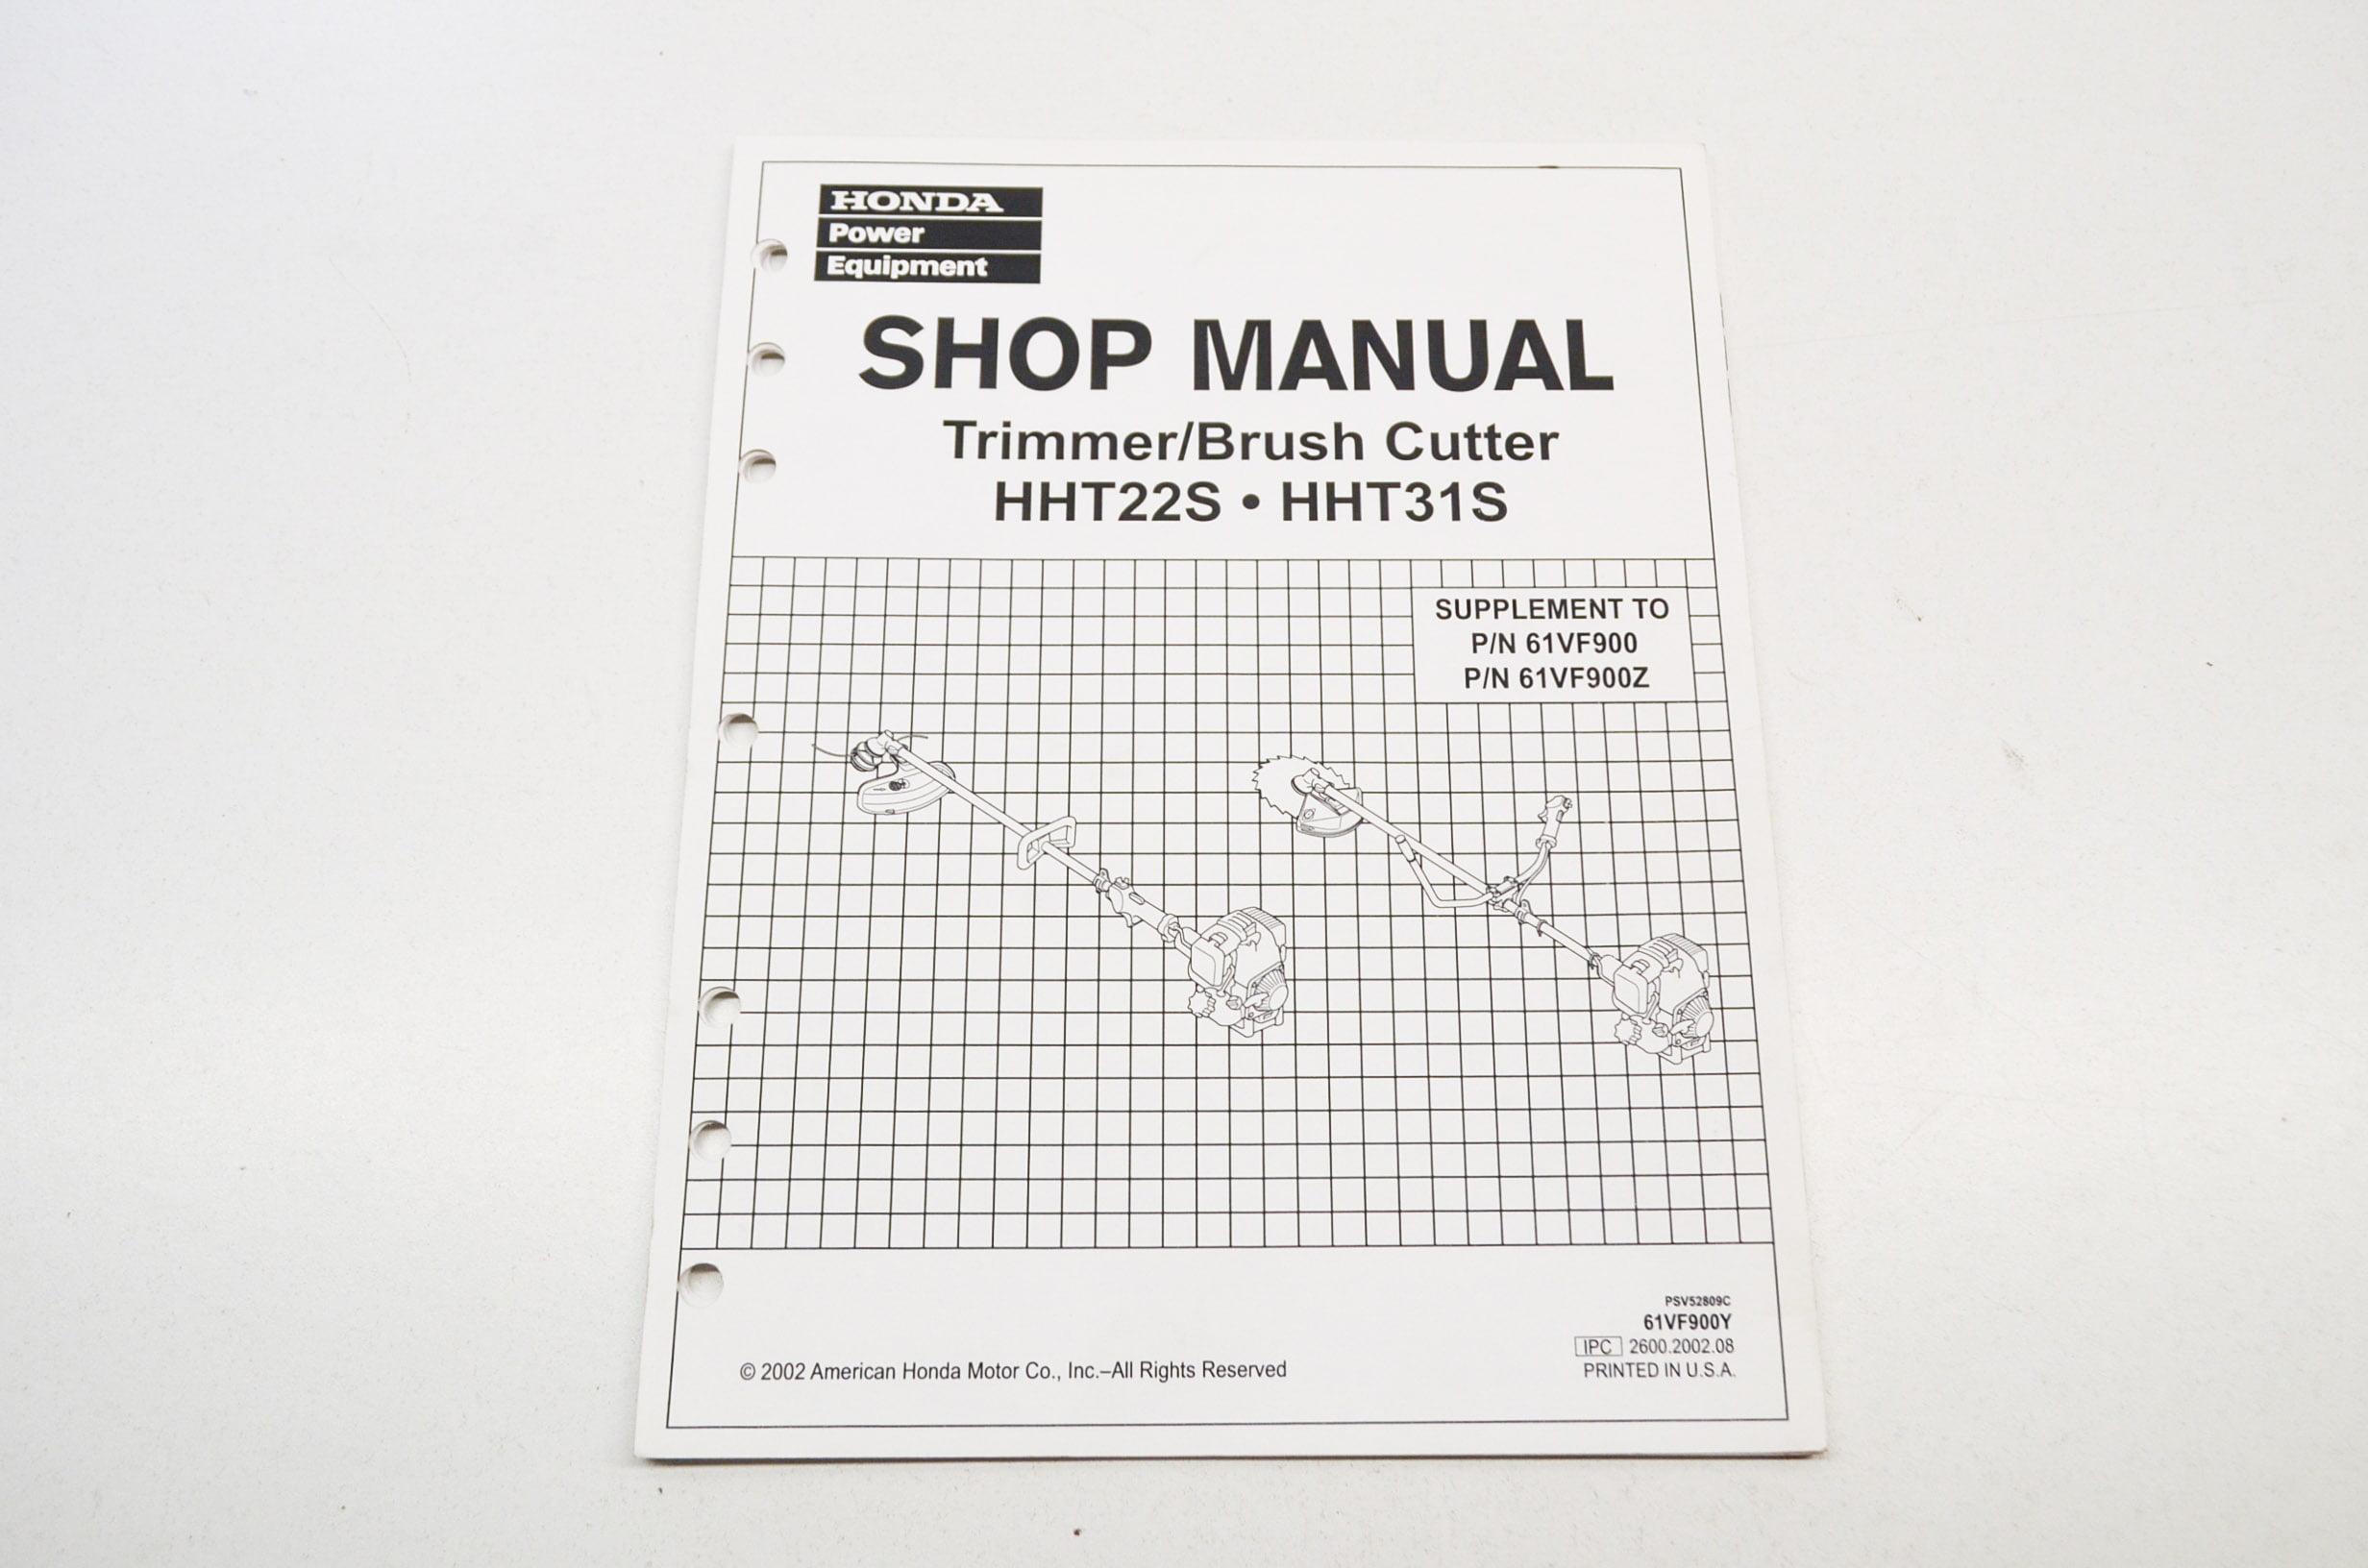 Honda trimmer Hht25s Shop manual